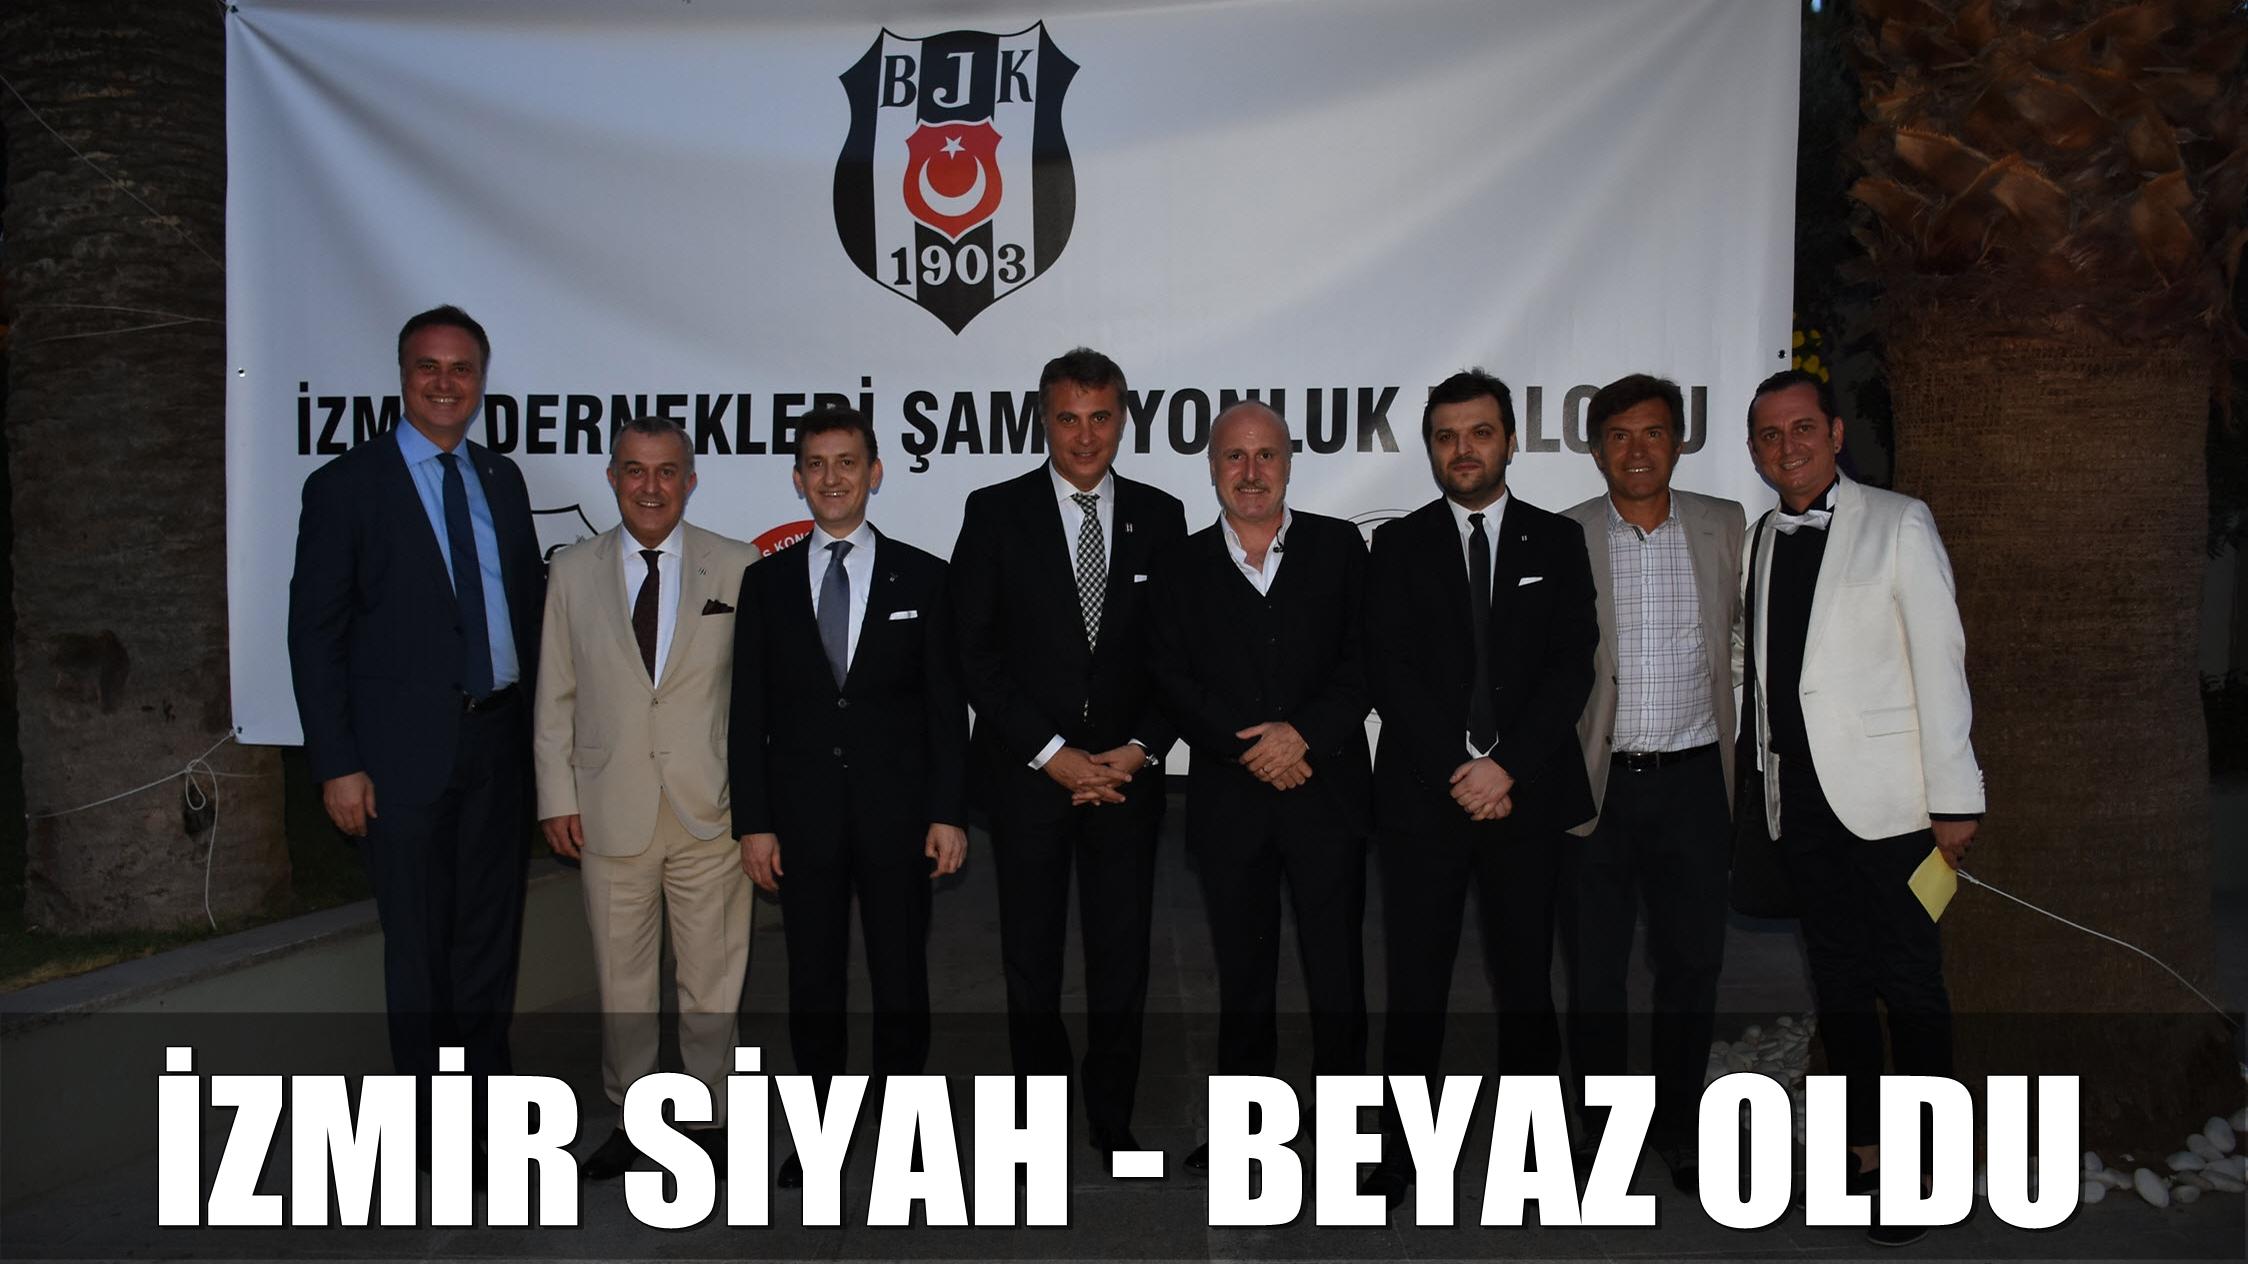 İzmir Siyah - Beyaz Oldu